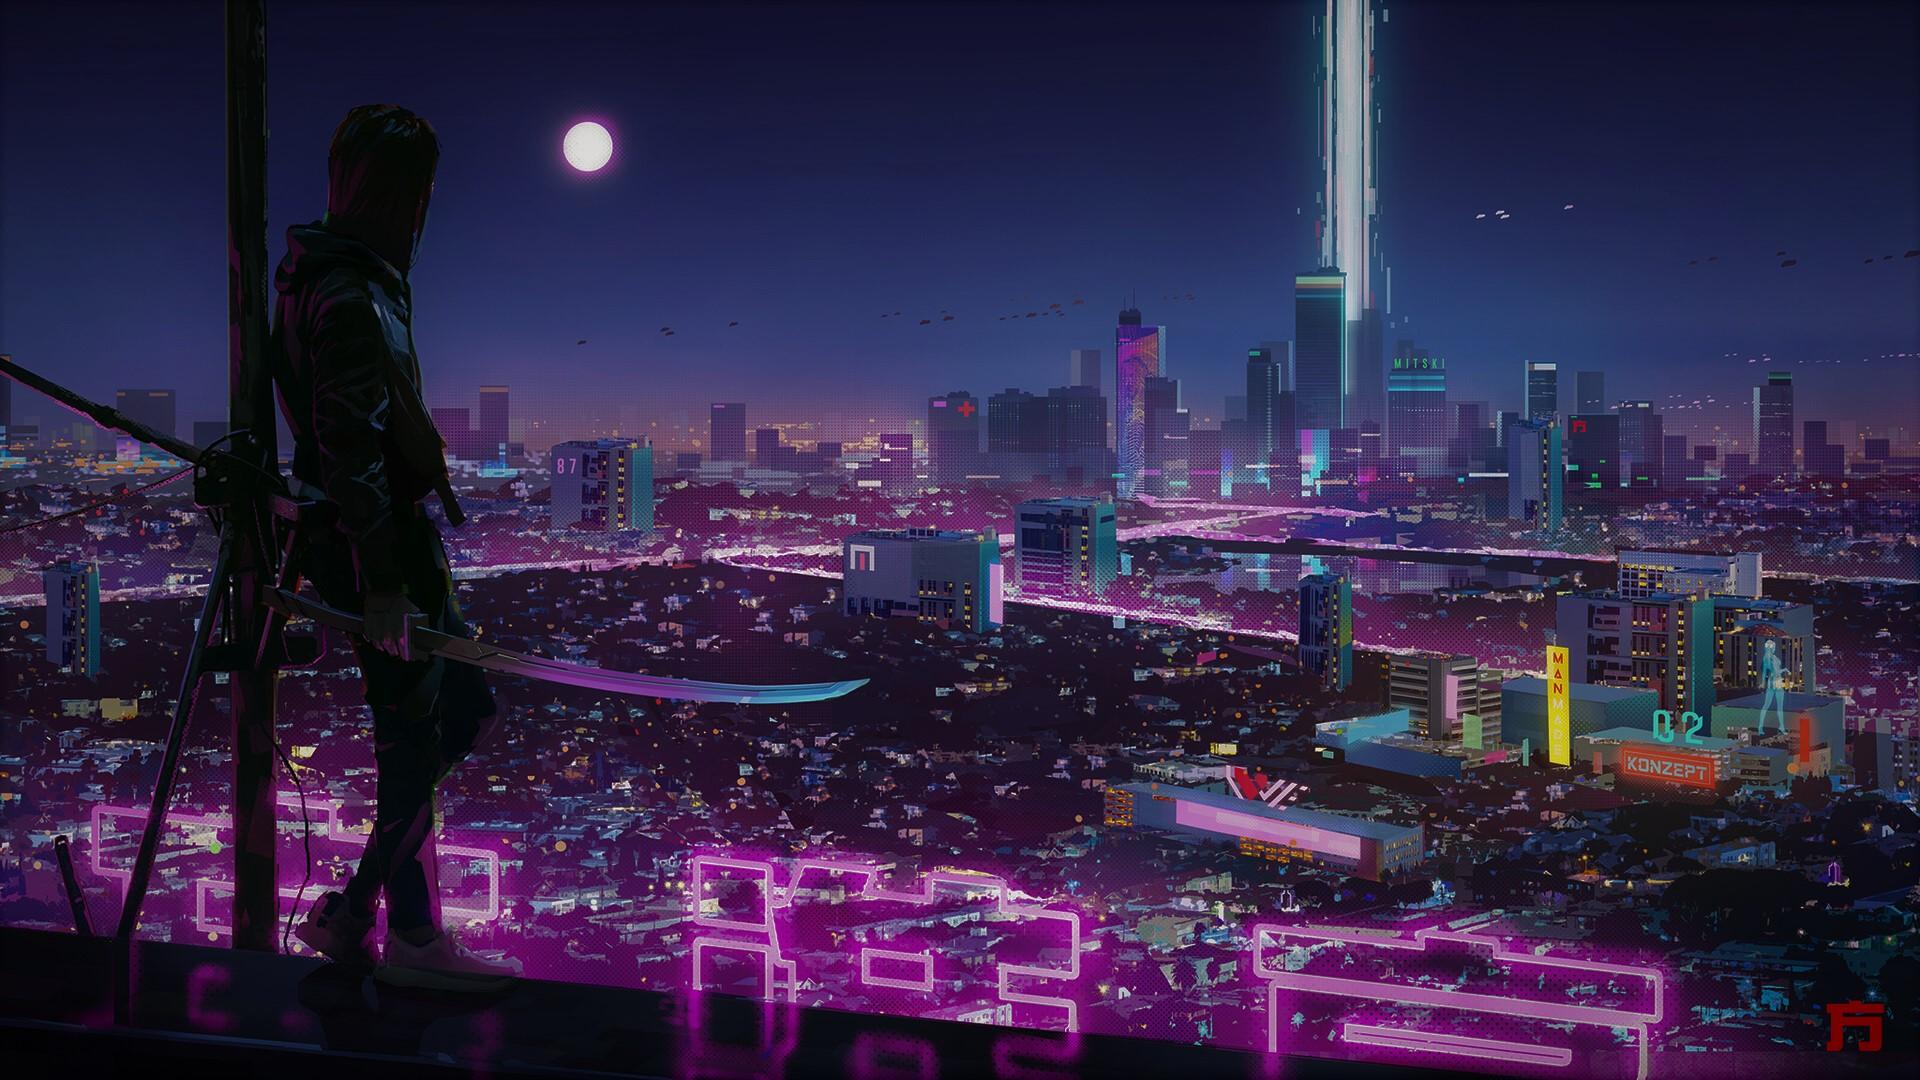 Wallpaper Cyber Neon City Technology Futuristic Digital 1920x1080 Michael997 1767067 Hd Wallpapers Wallhere